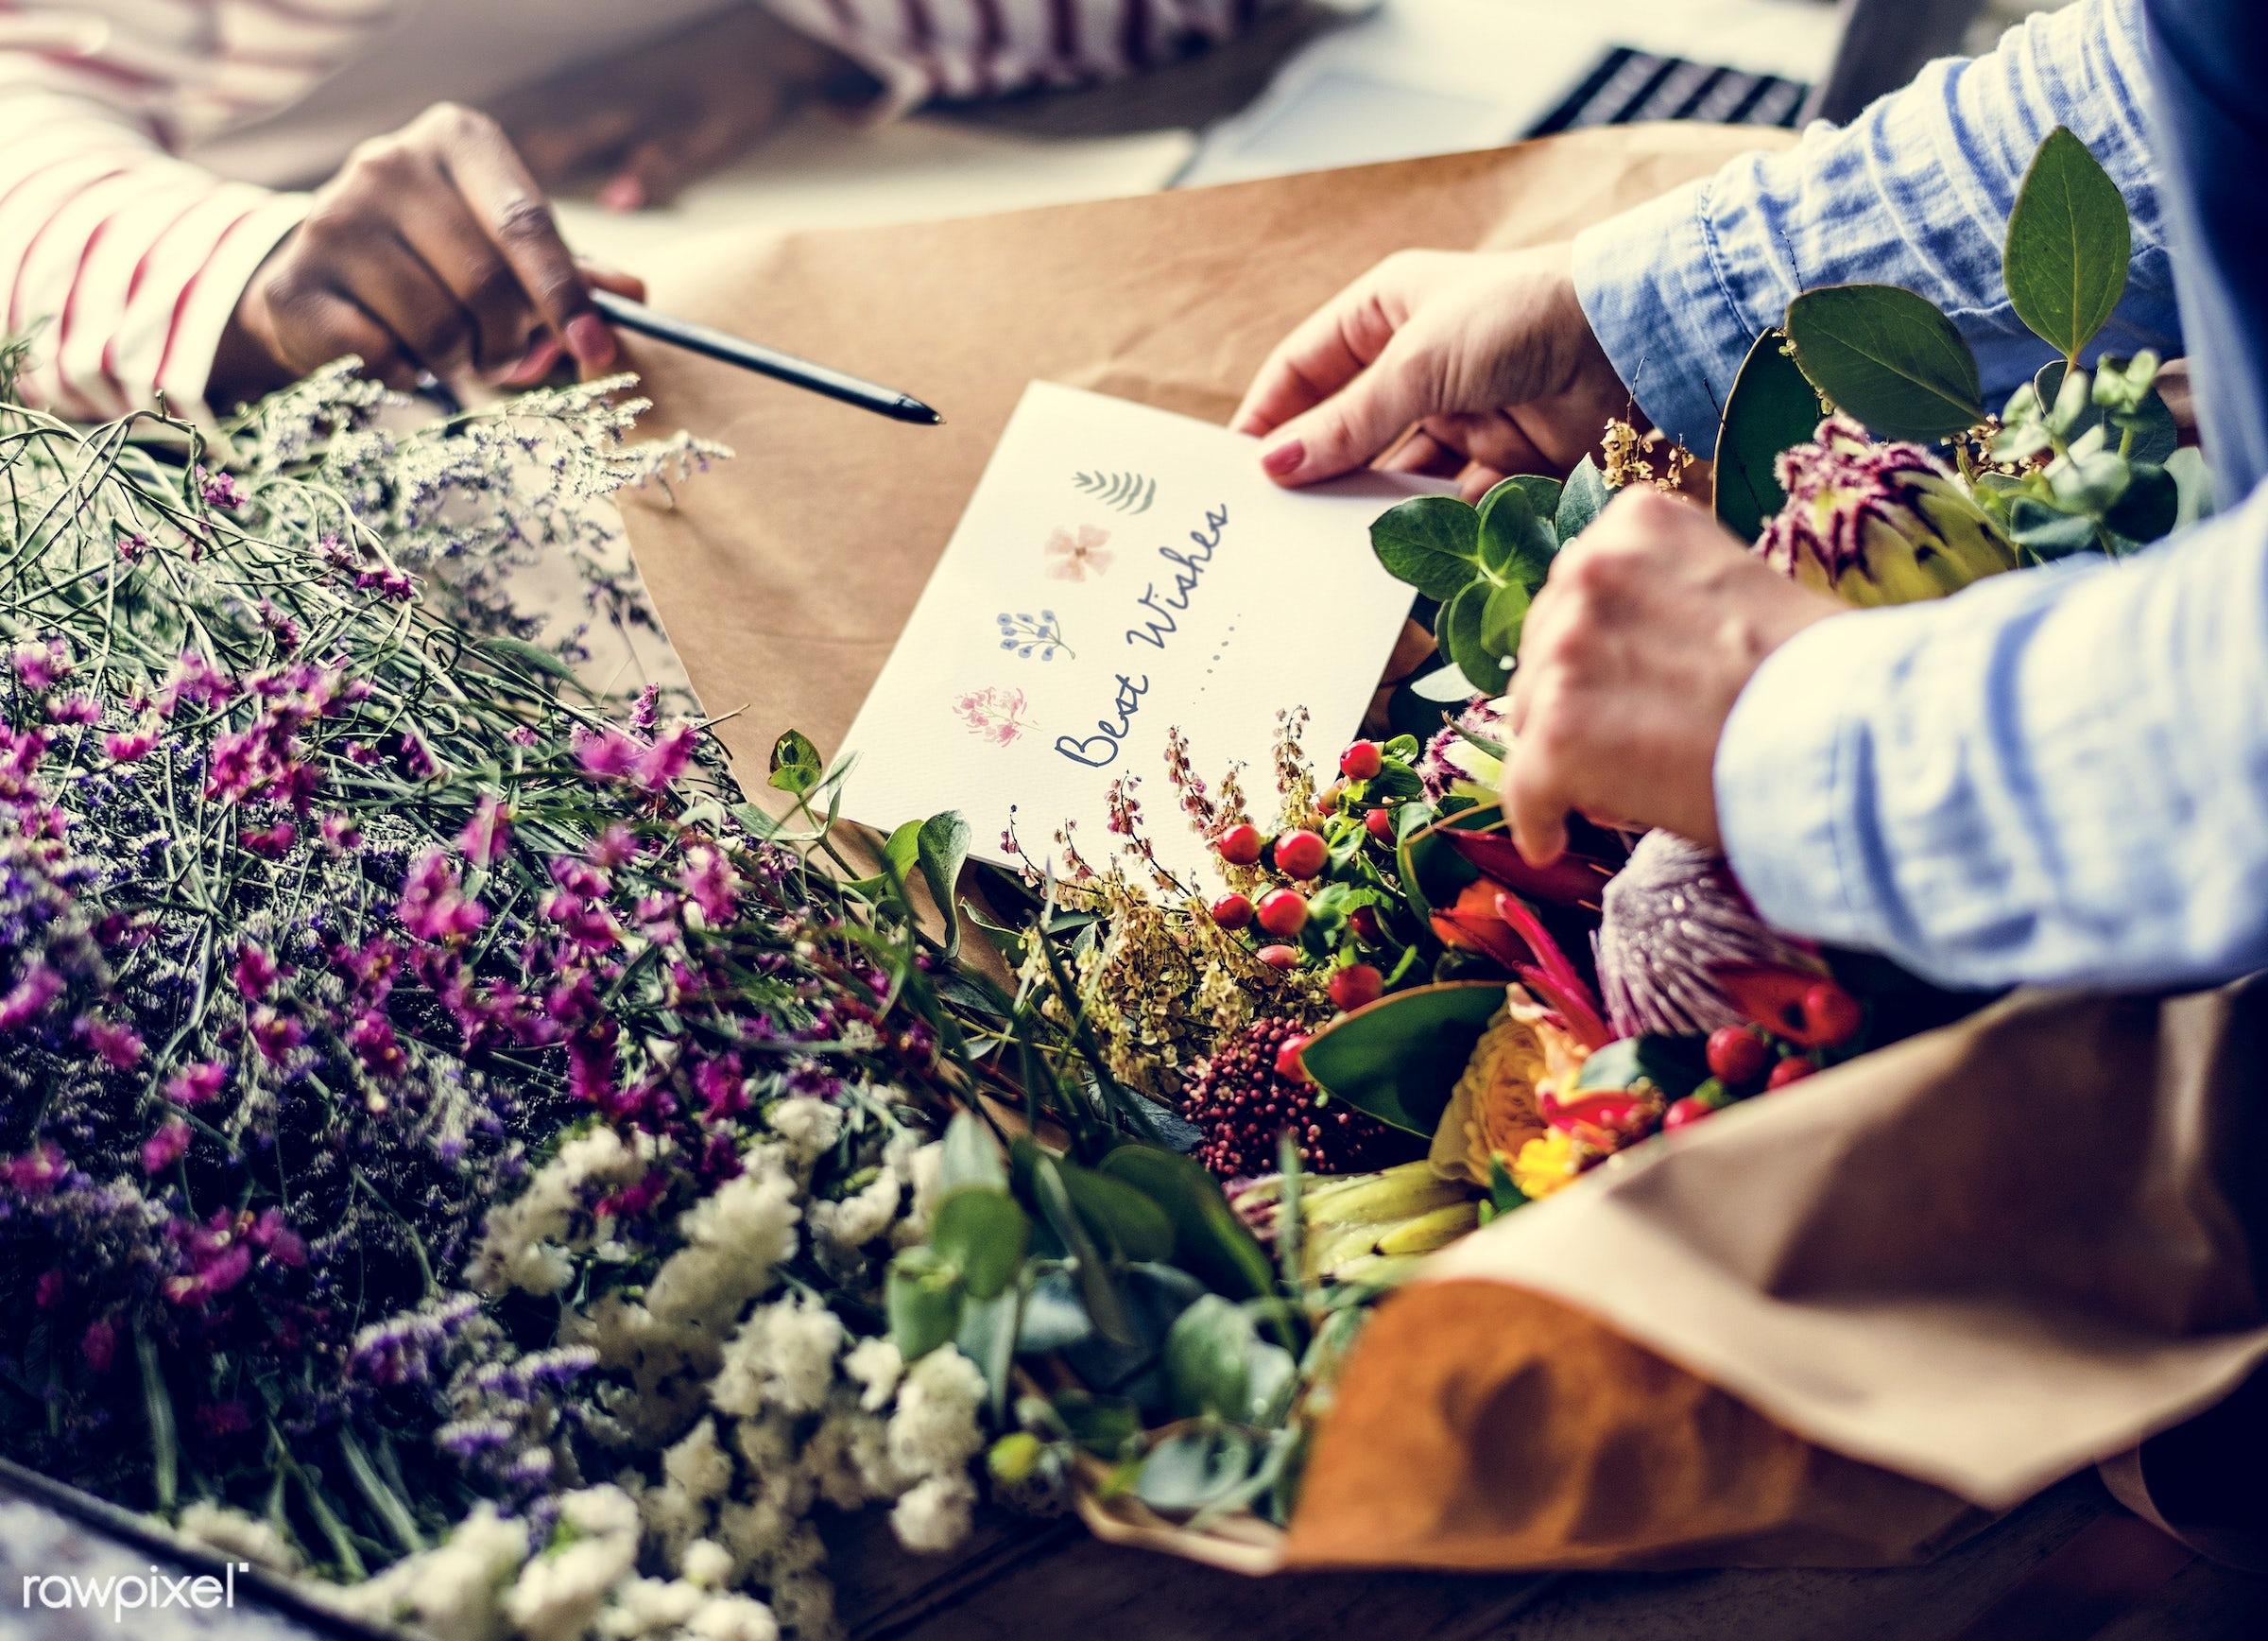 bouquet, shop, detail, person, wish, people, wax flower, decor, nature, card, flowers, work, refreshment, florist, present,...